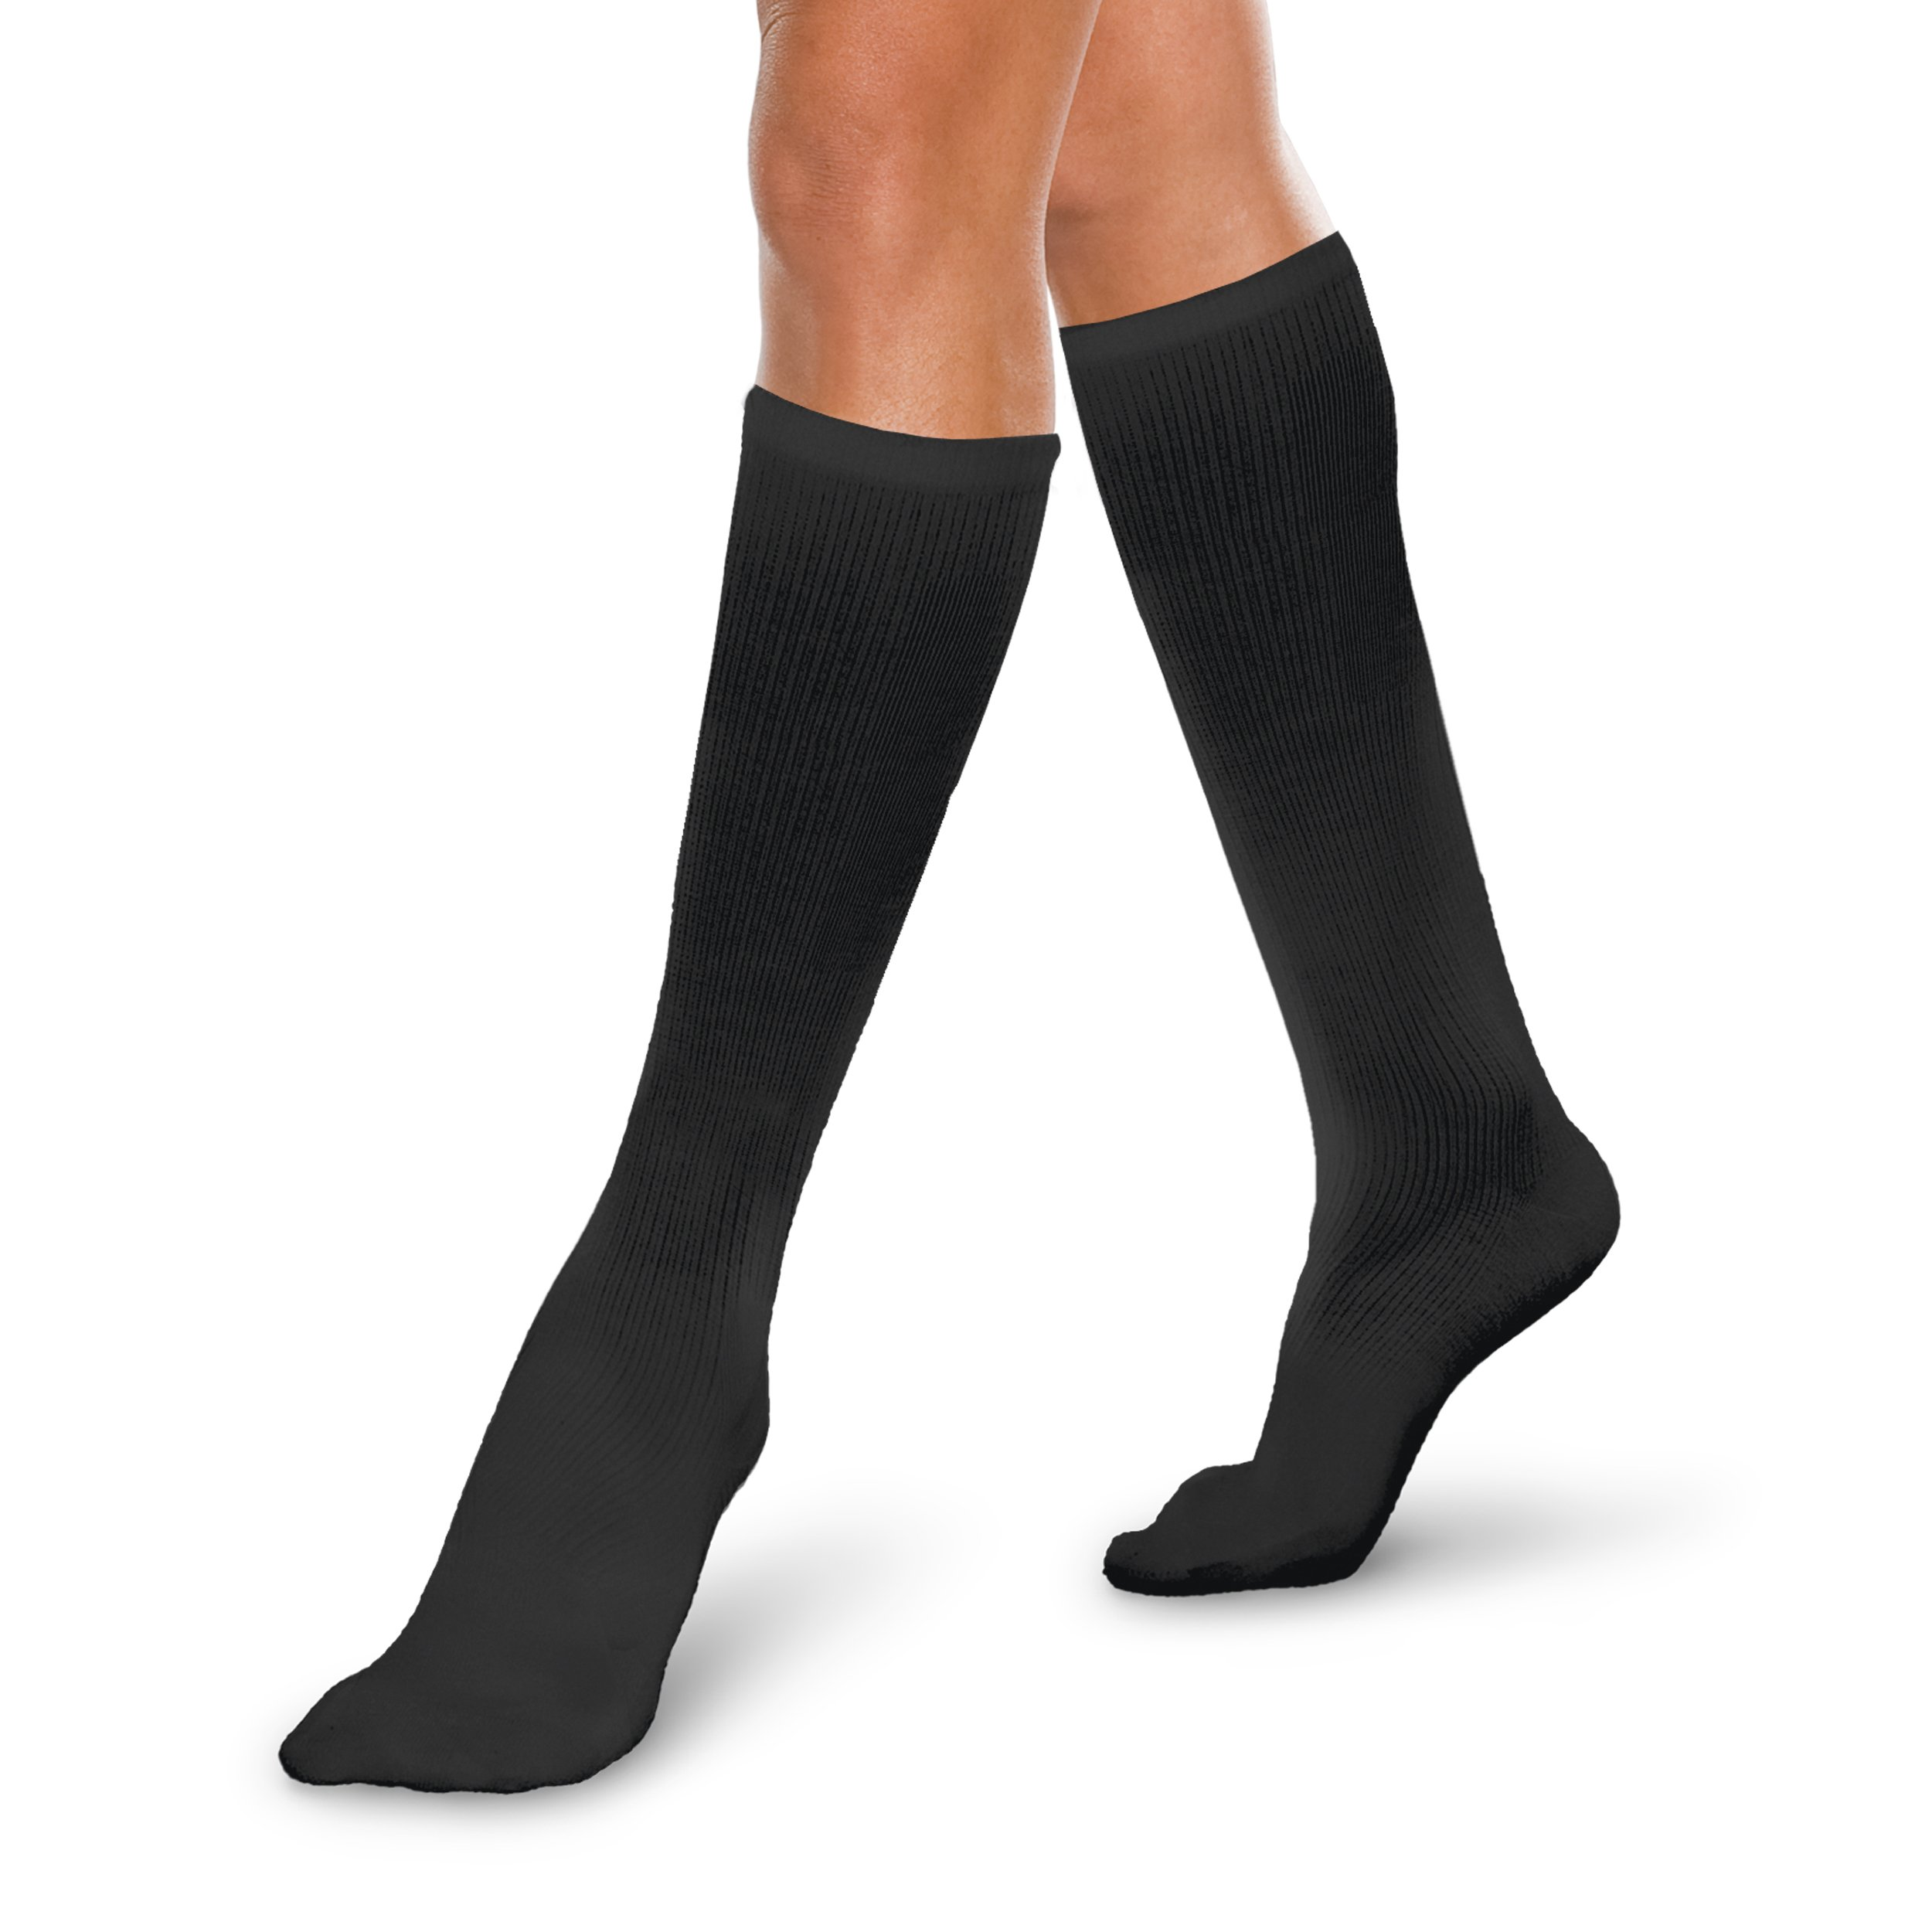 Therafirm Core-Spun Mild (15-20mmHg) Graduated Compression Support Knee High Socks (Black, Medium)